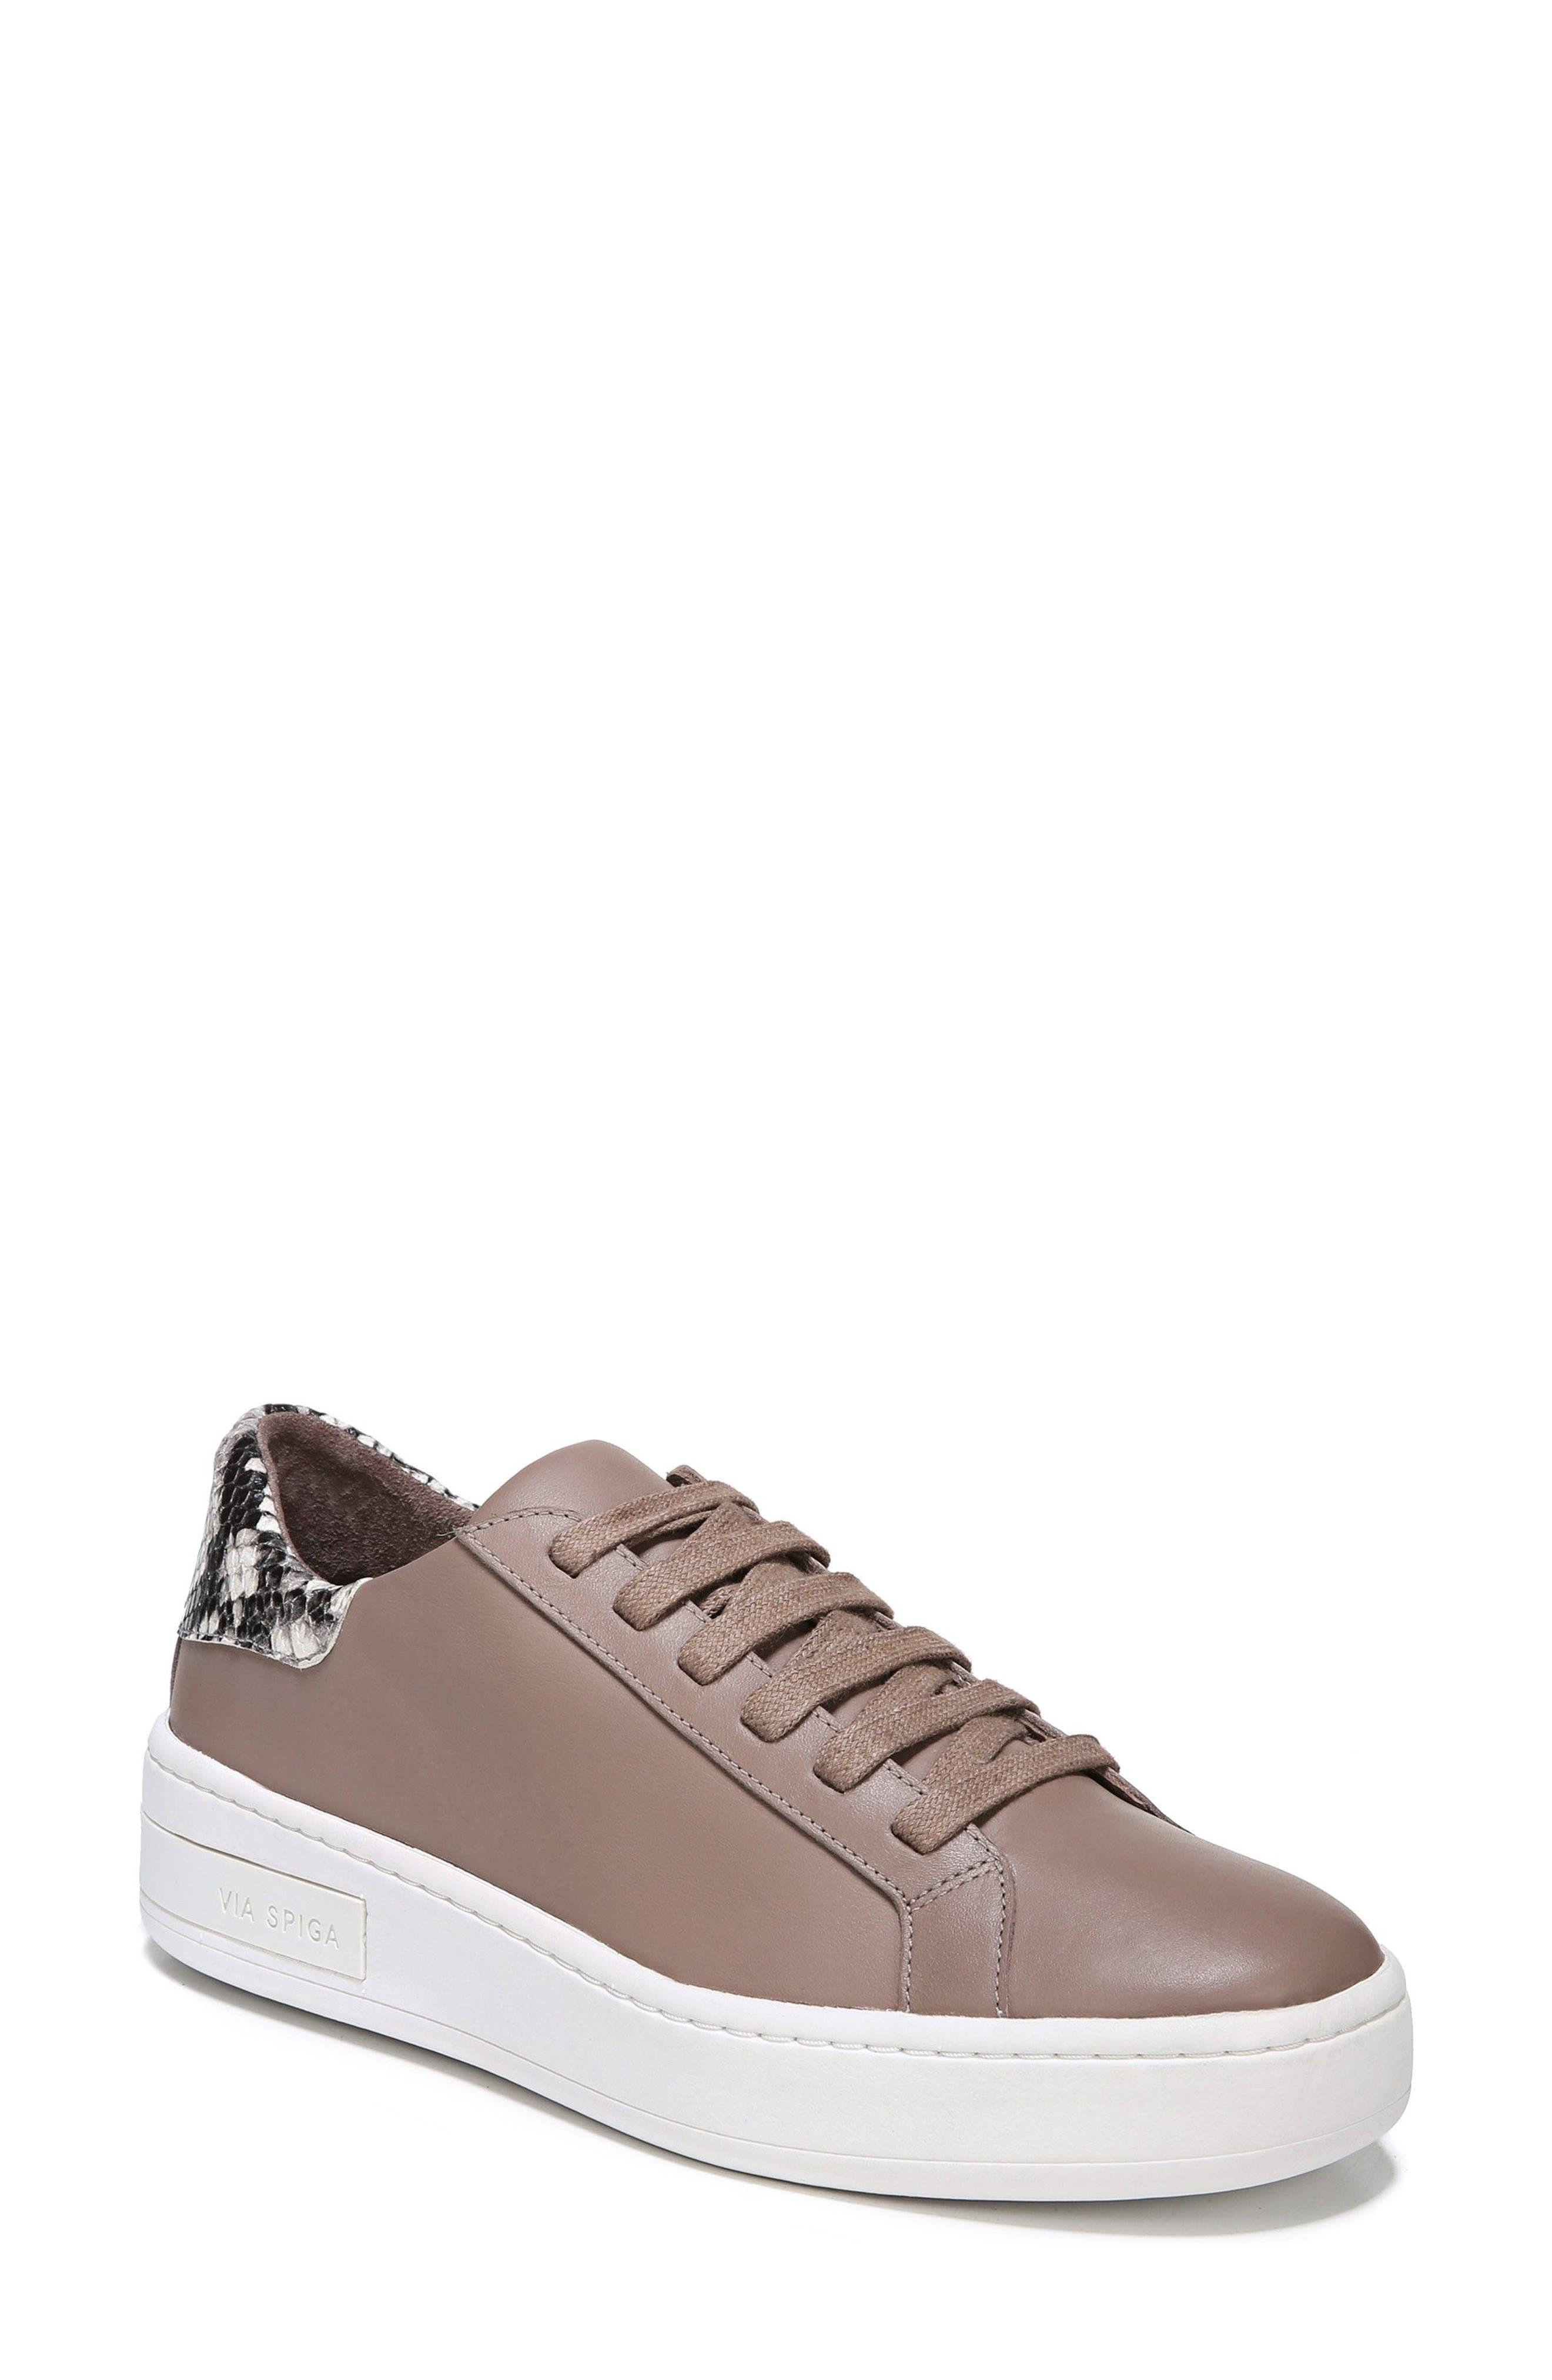 Rylen Platform Sneaker,                             Main thumbnail 1, color,                             Porcini/ Black/ White Leather